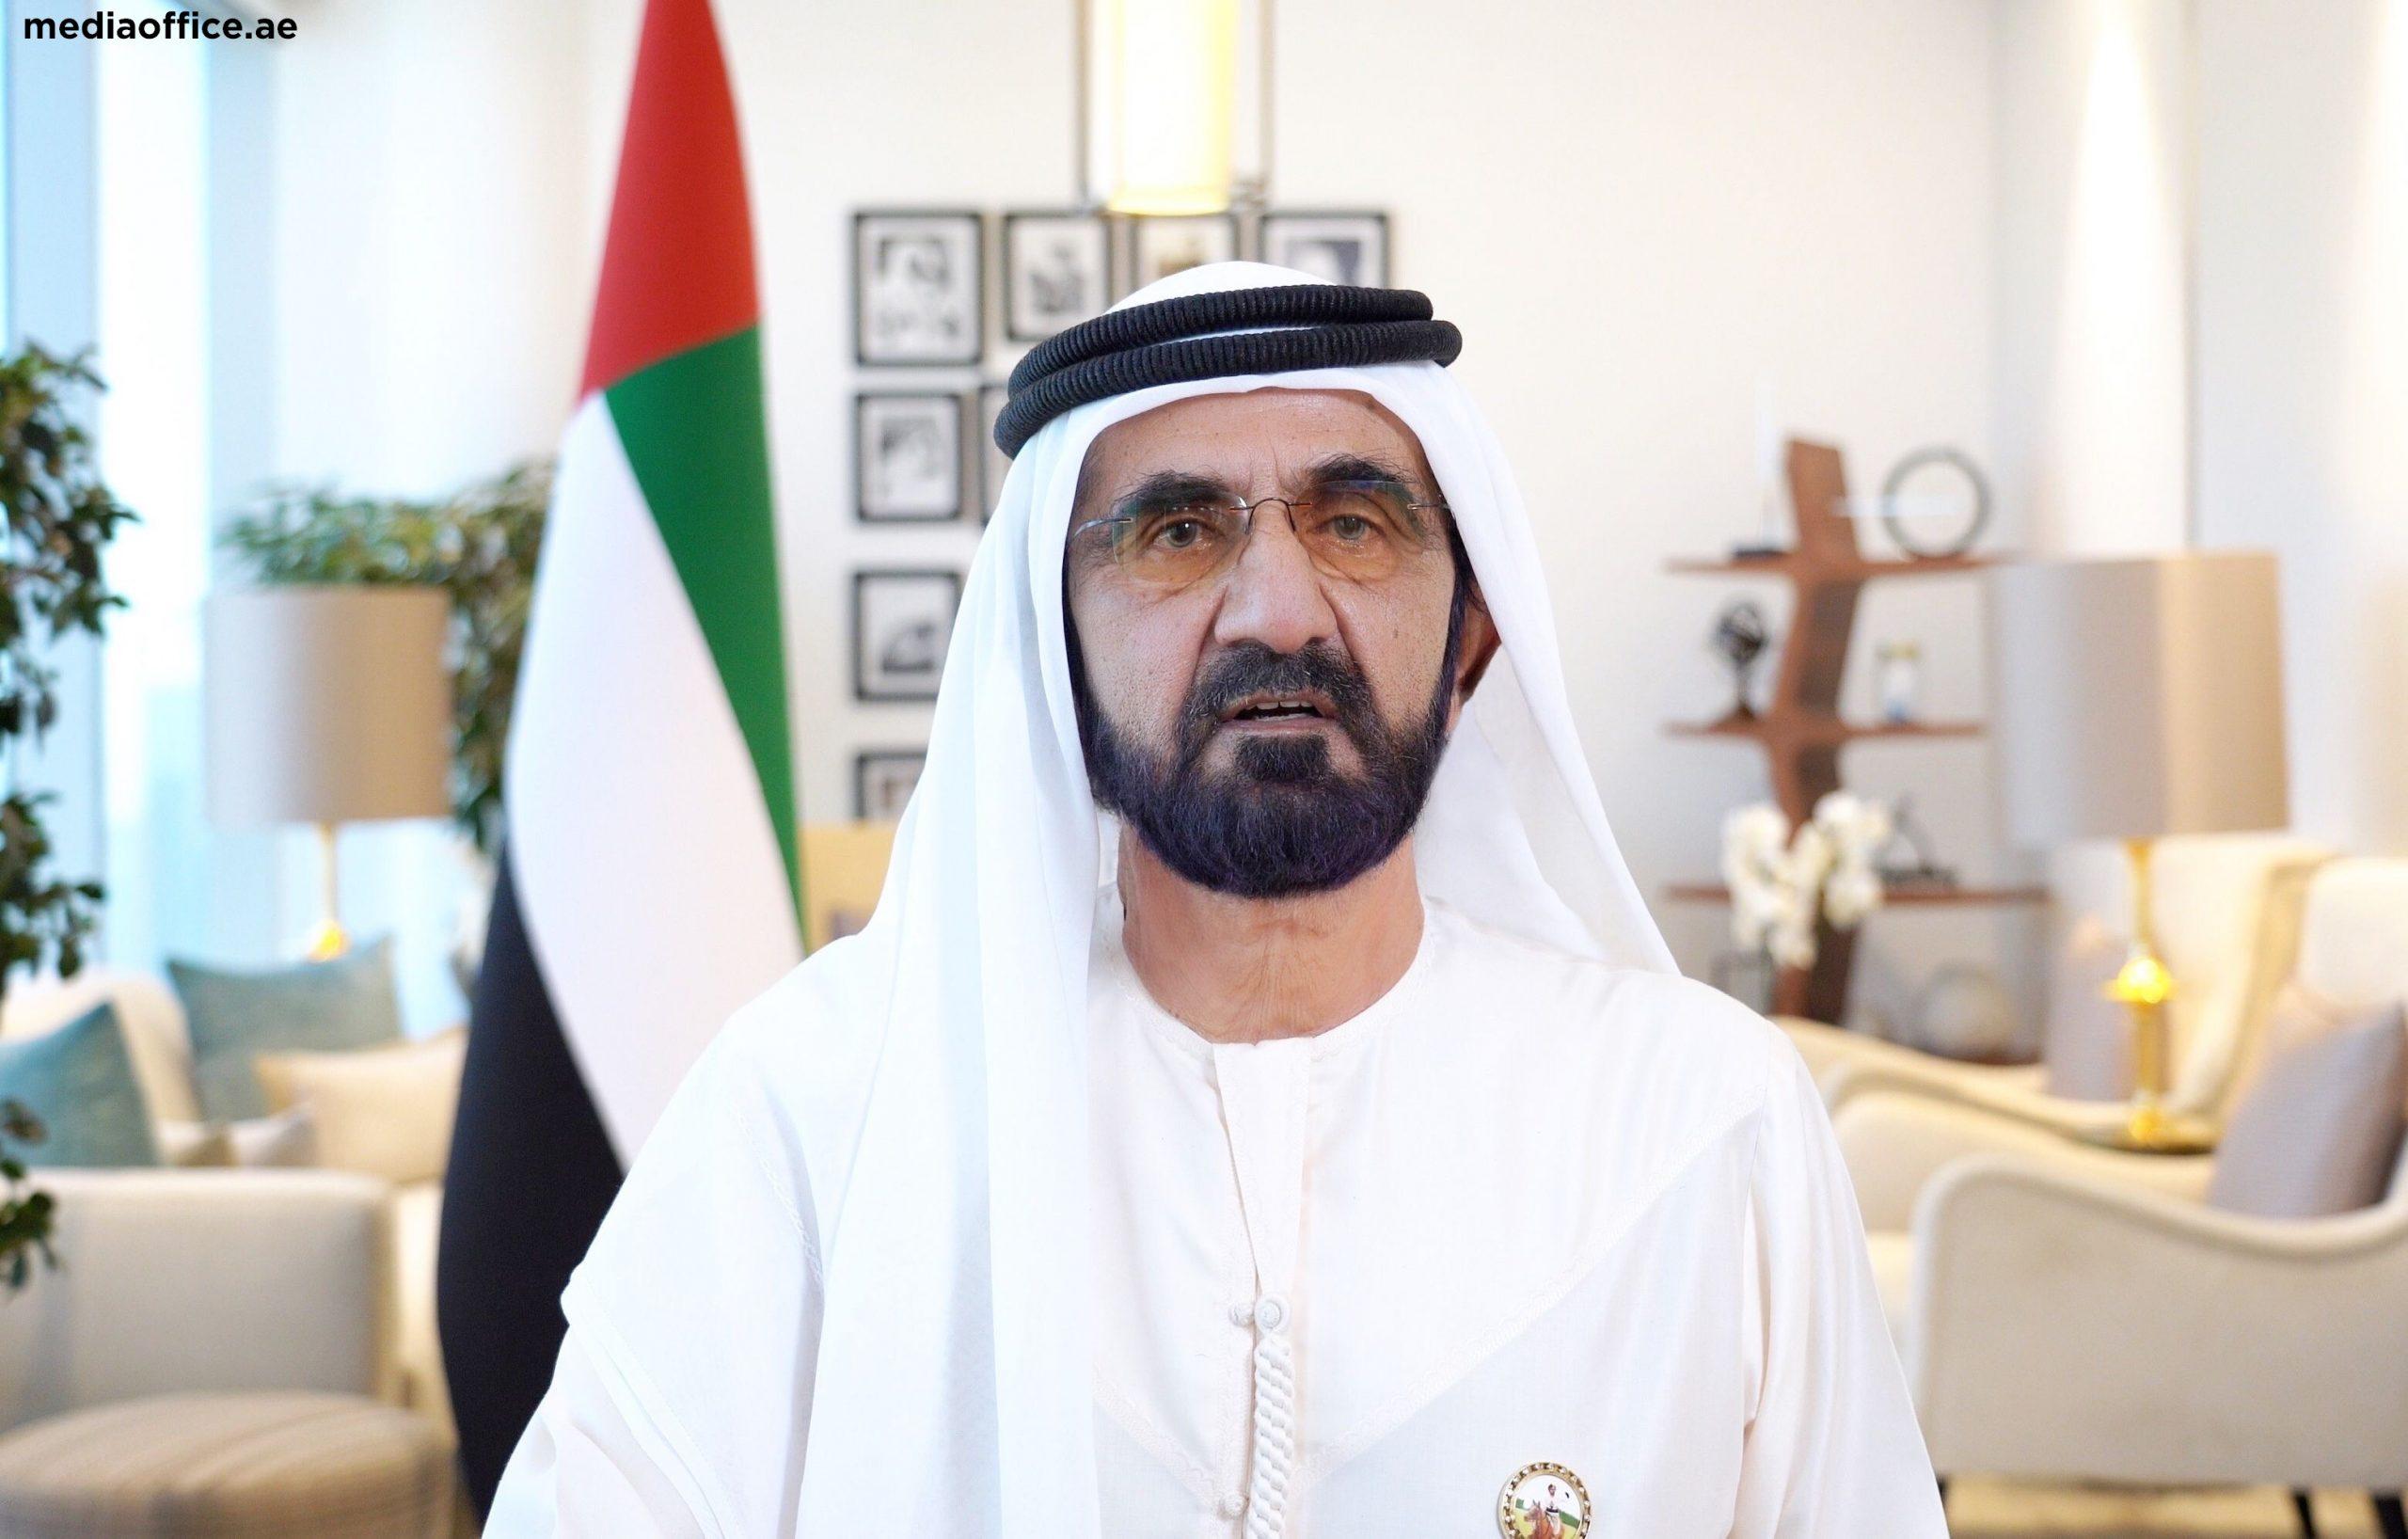 DIHAD 2021 starts under the patronage of Mohammed bin Rashid